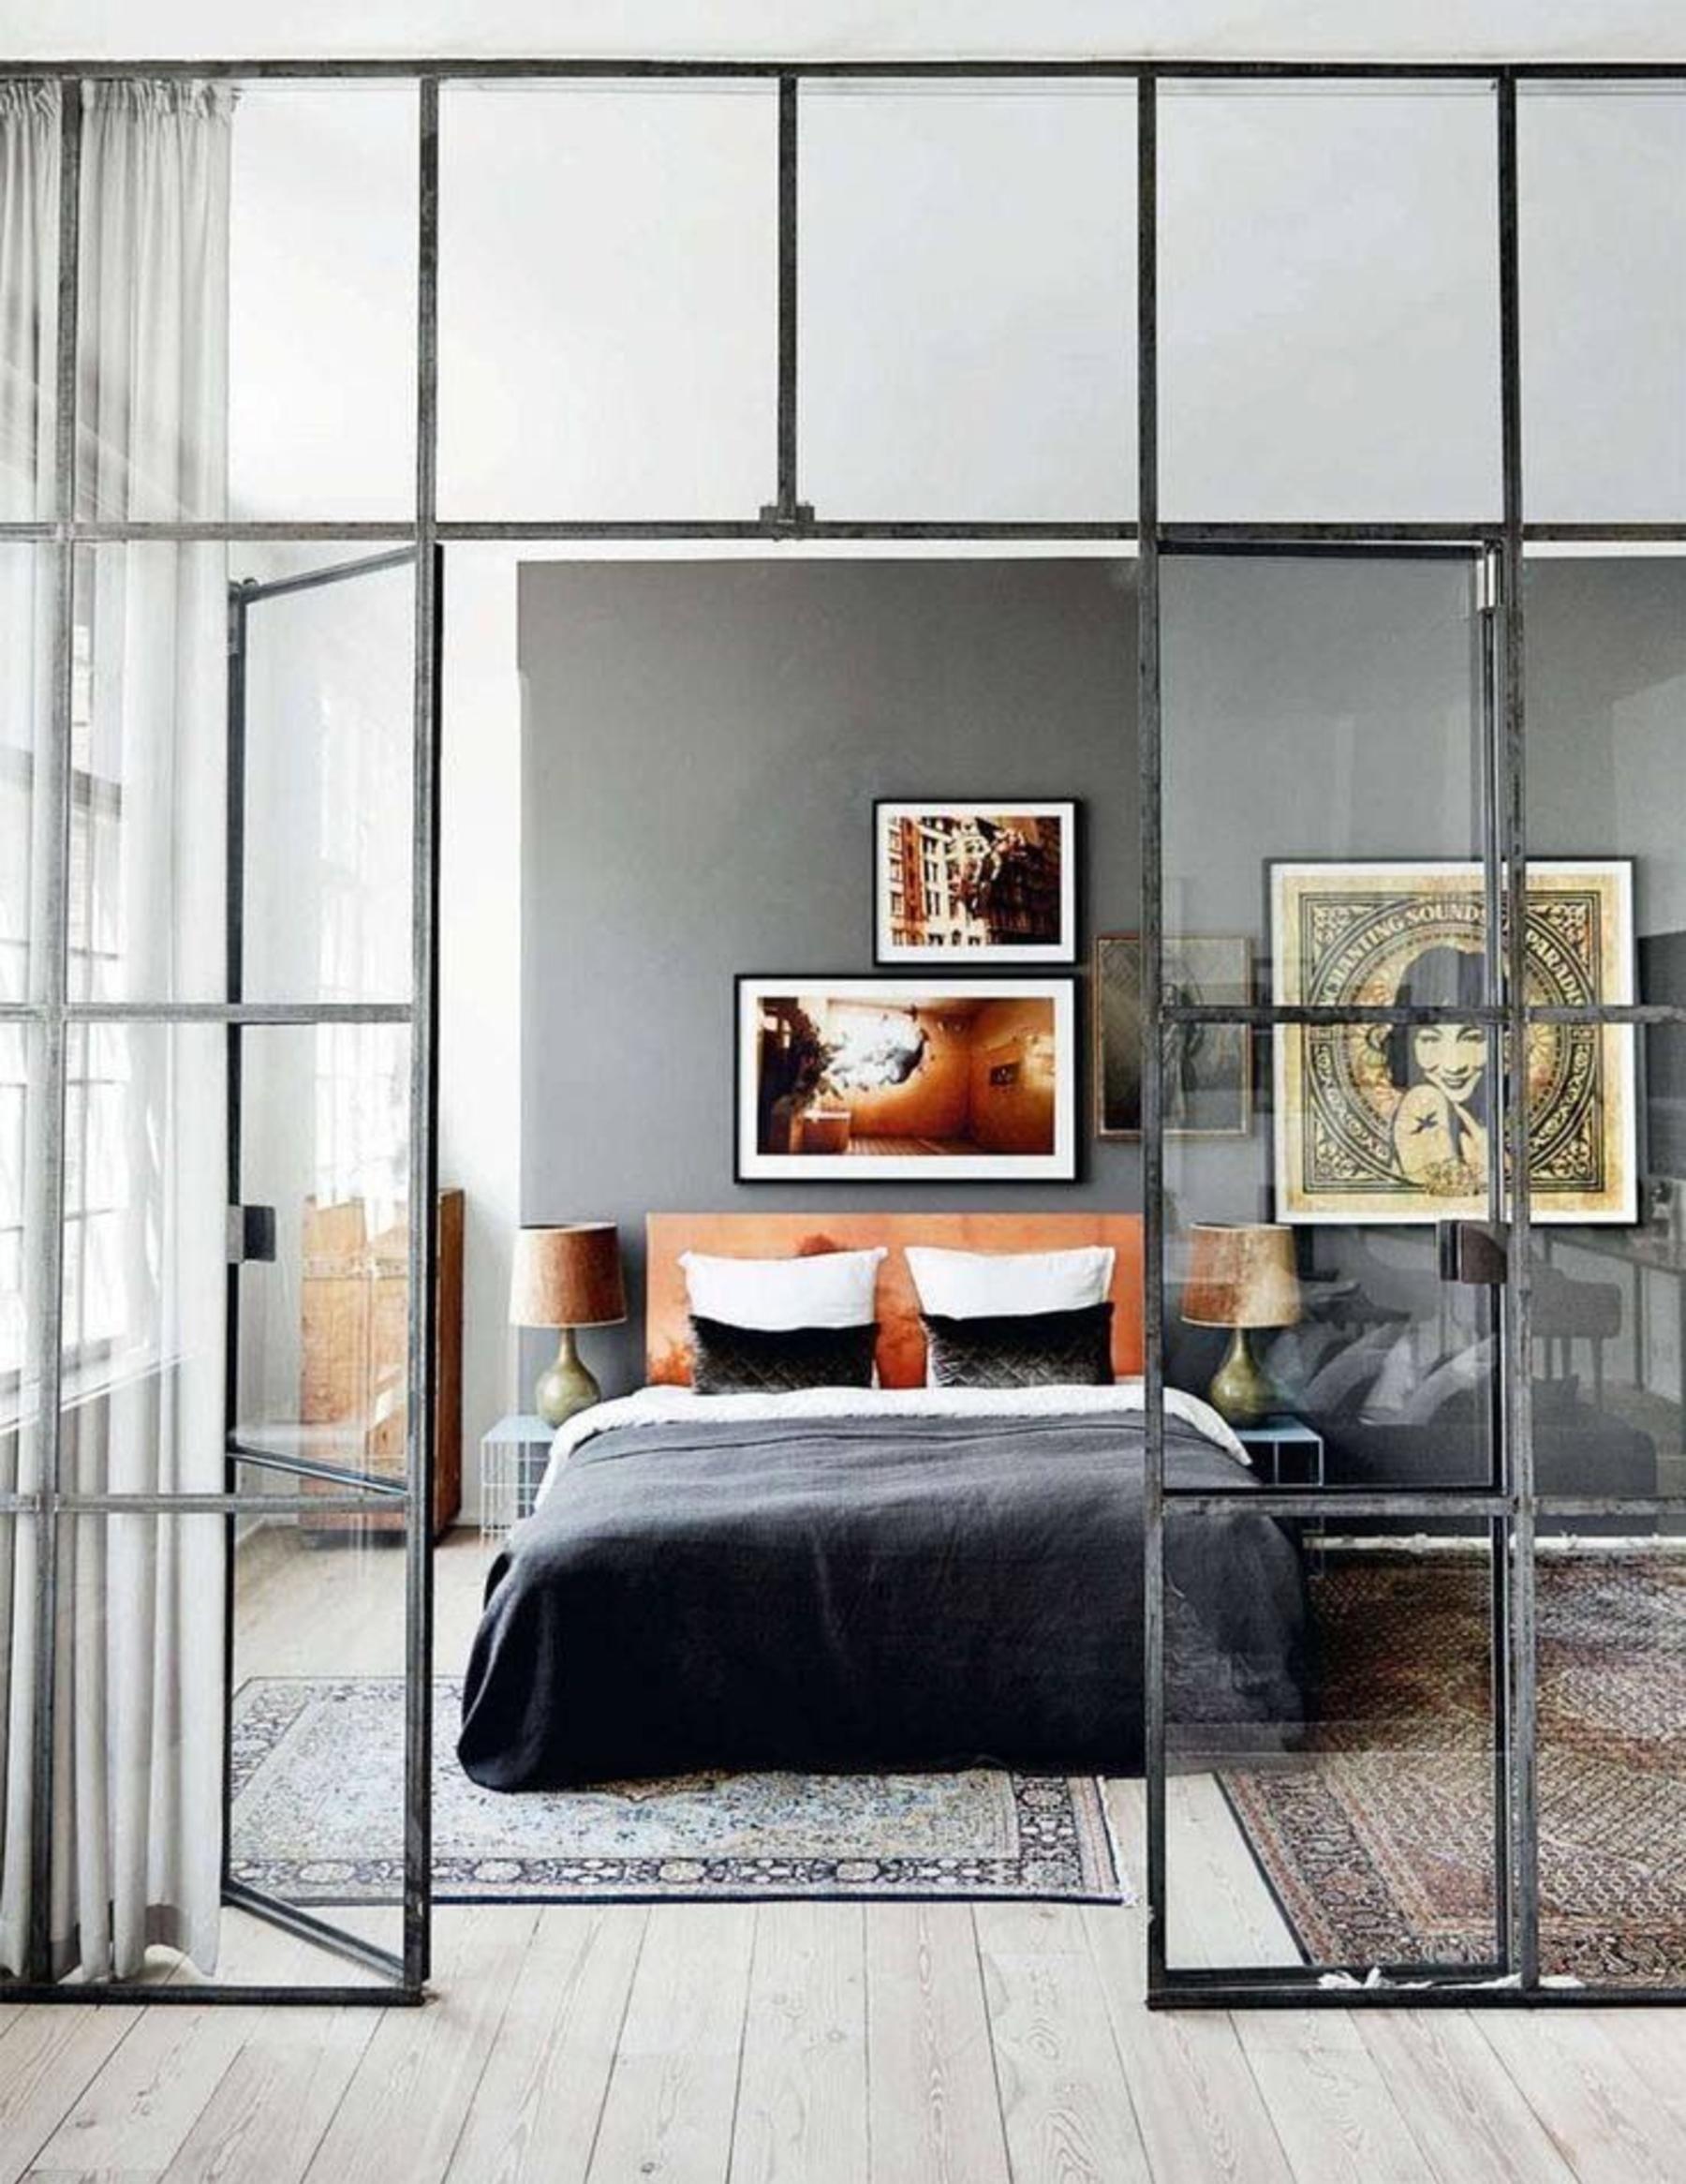 13 Examples Of Industrial Doors Amplifying An Interior